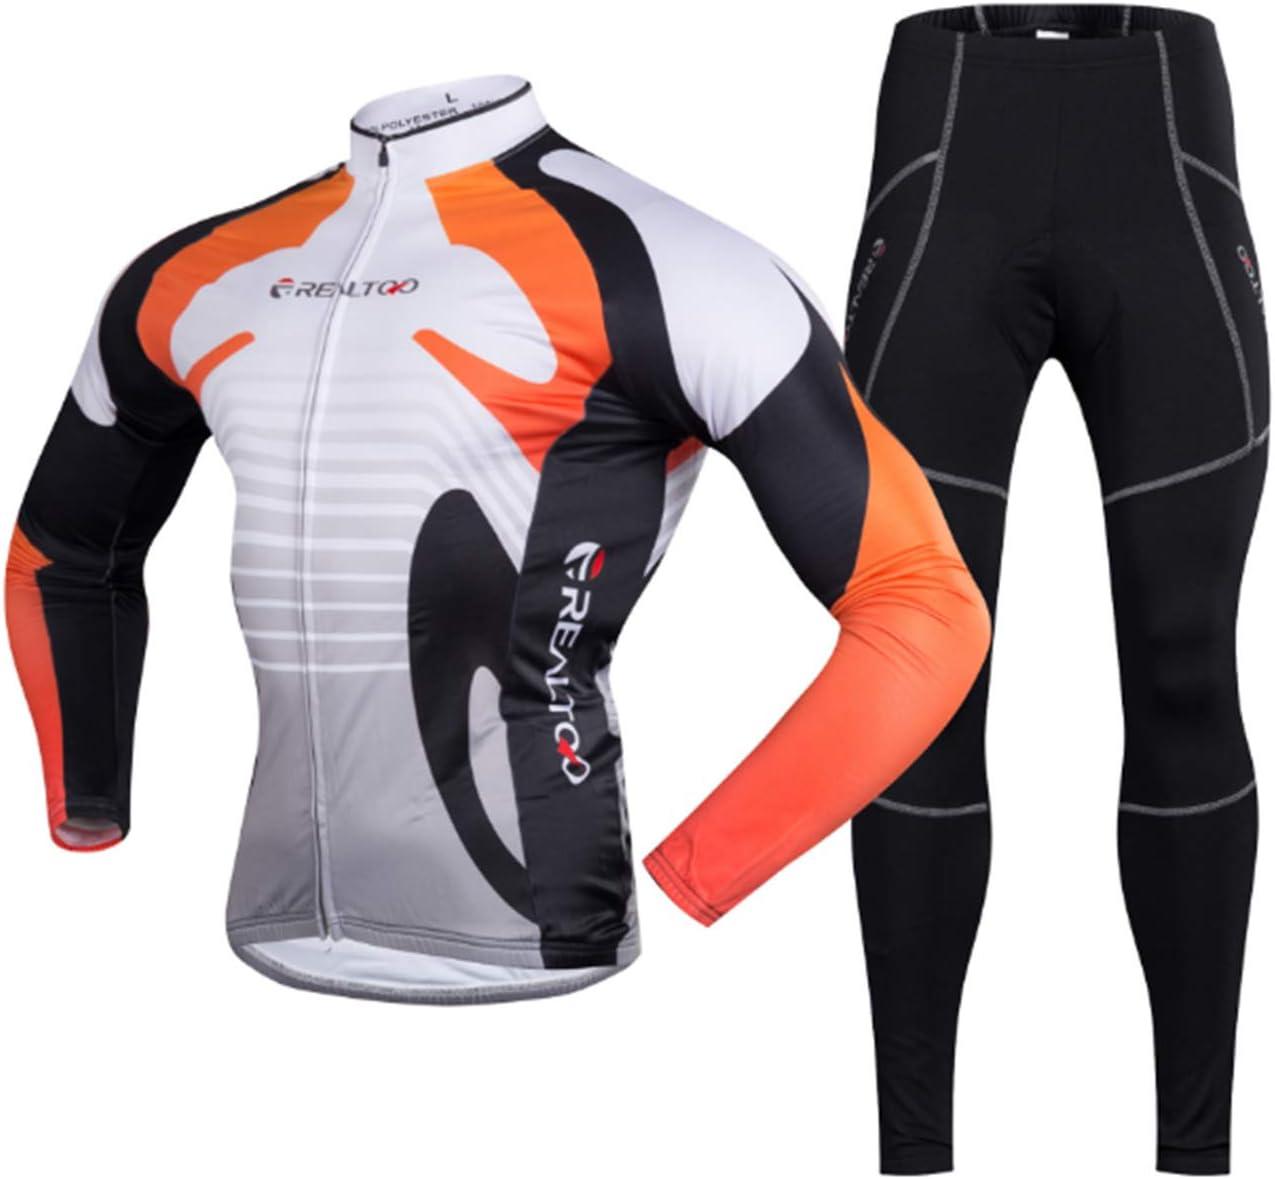 Orange M KIKIYA Herren Radsportbekleidung Anzug Winter Thermo Fleece Sportswear Set Langarm Winddicht Jersey Mantel Jacke + 3D Gepolsterte Hose Hose